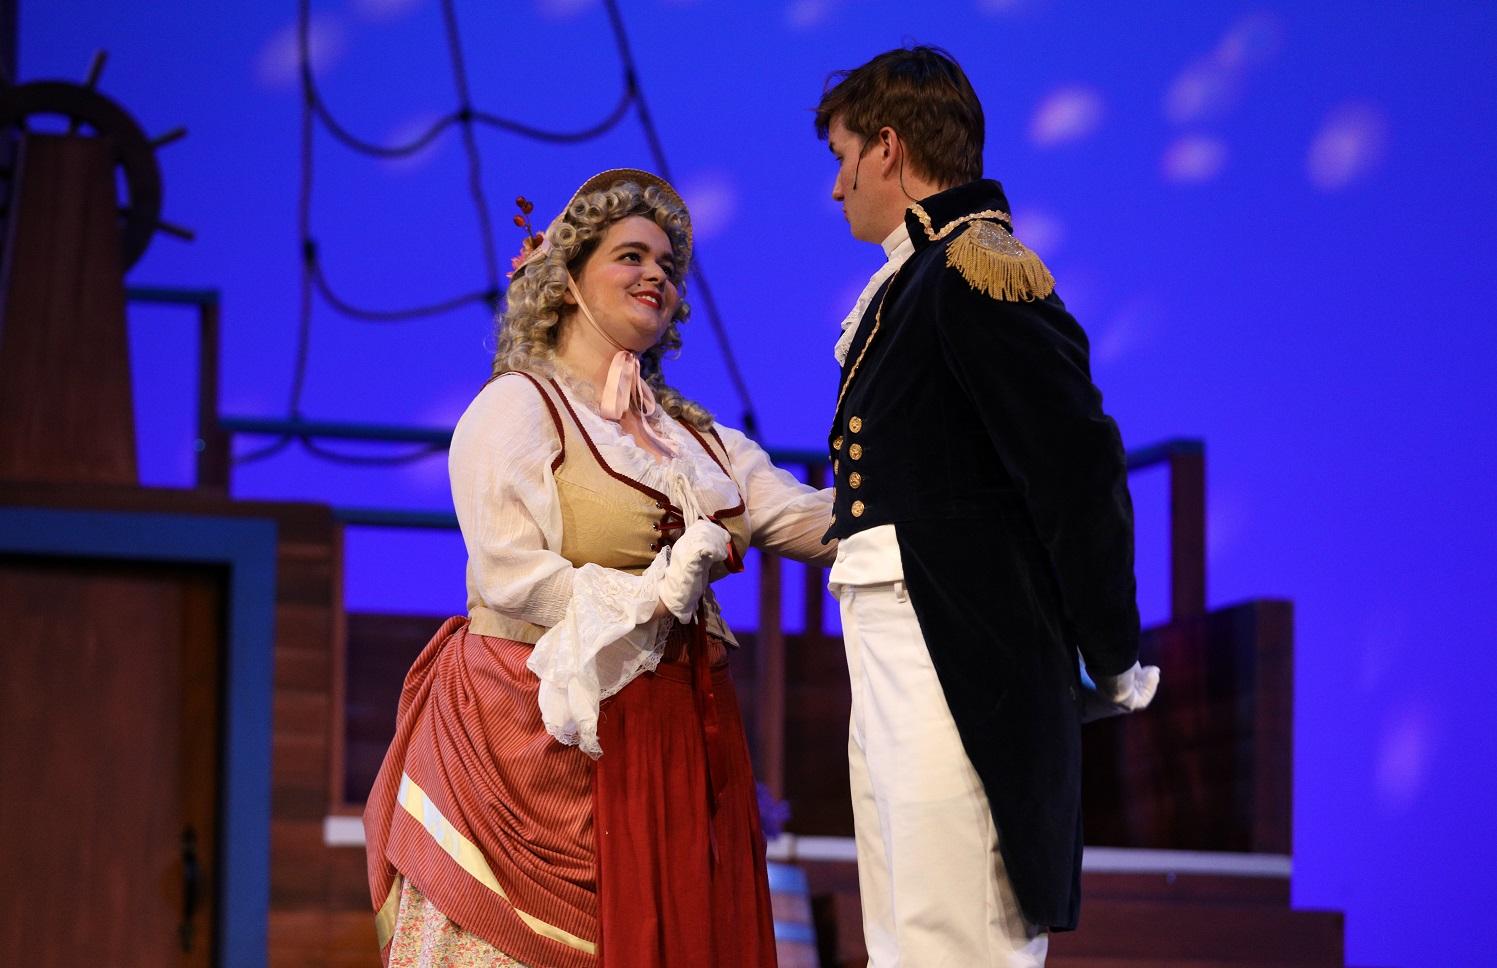 20170322_Music_Opera_HMS_Pinafore-358